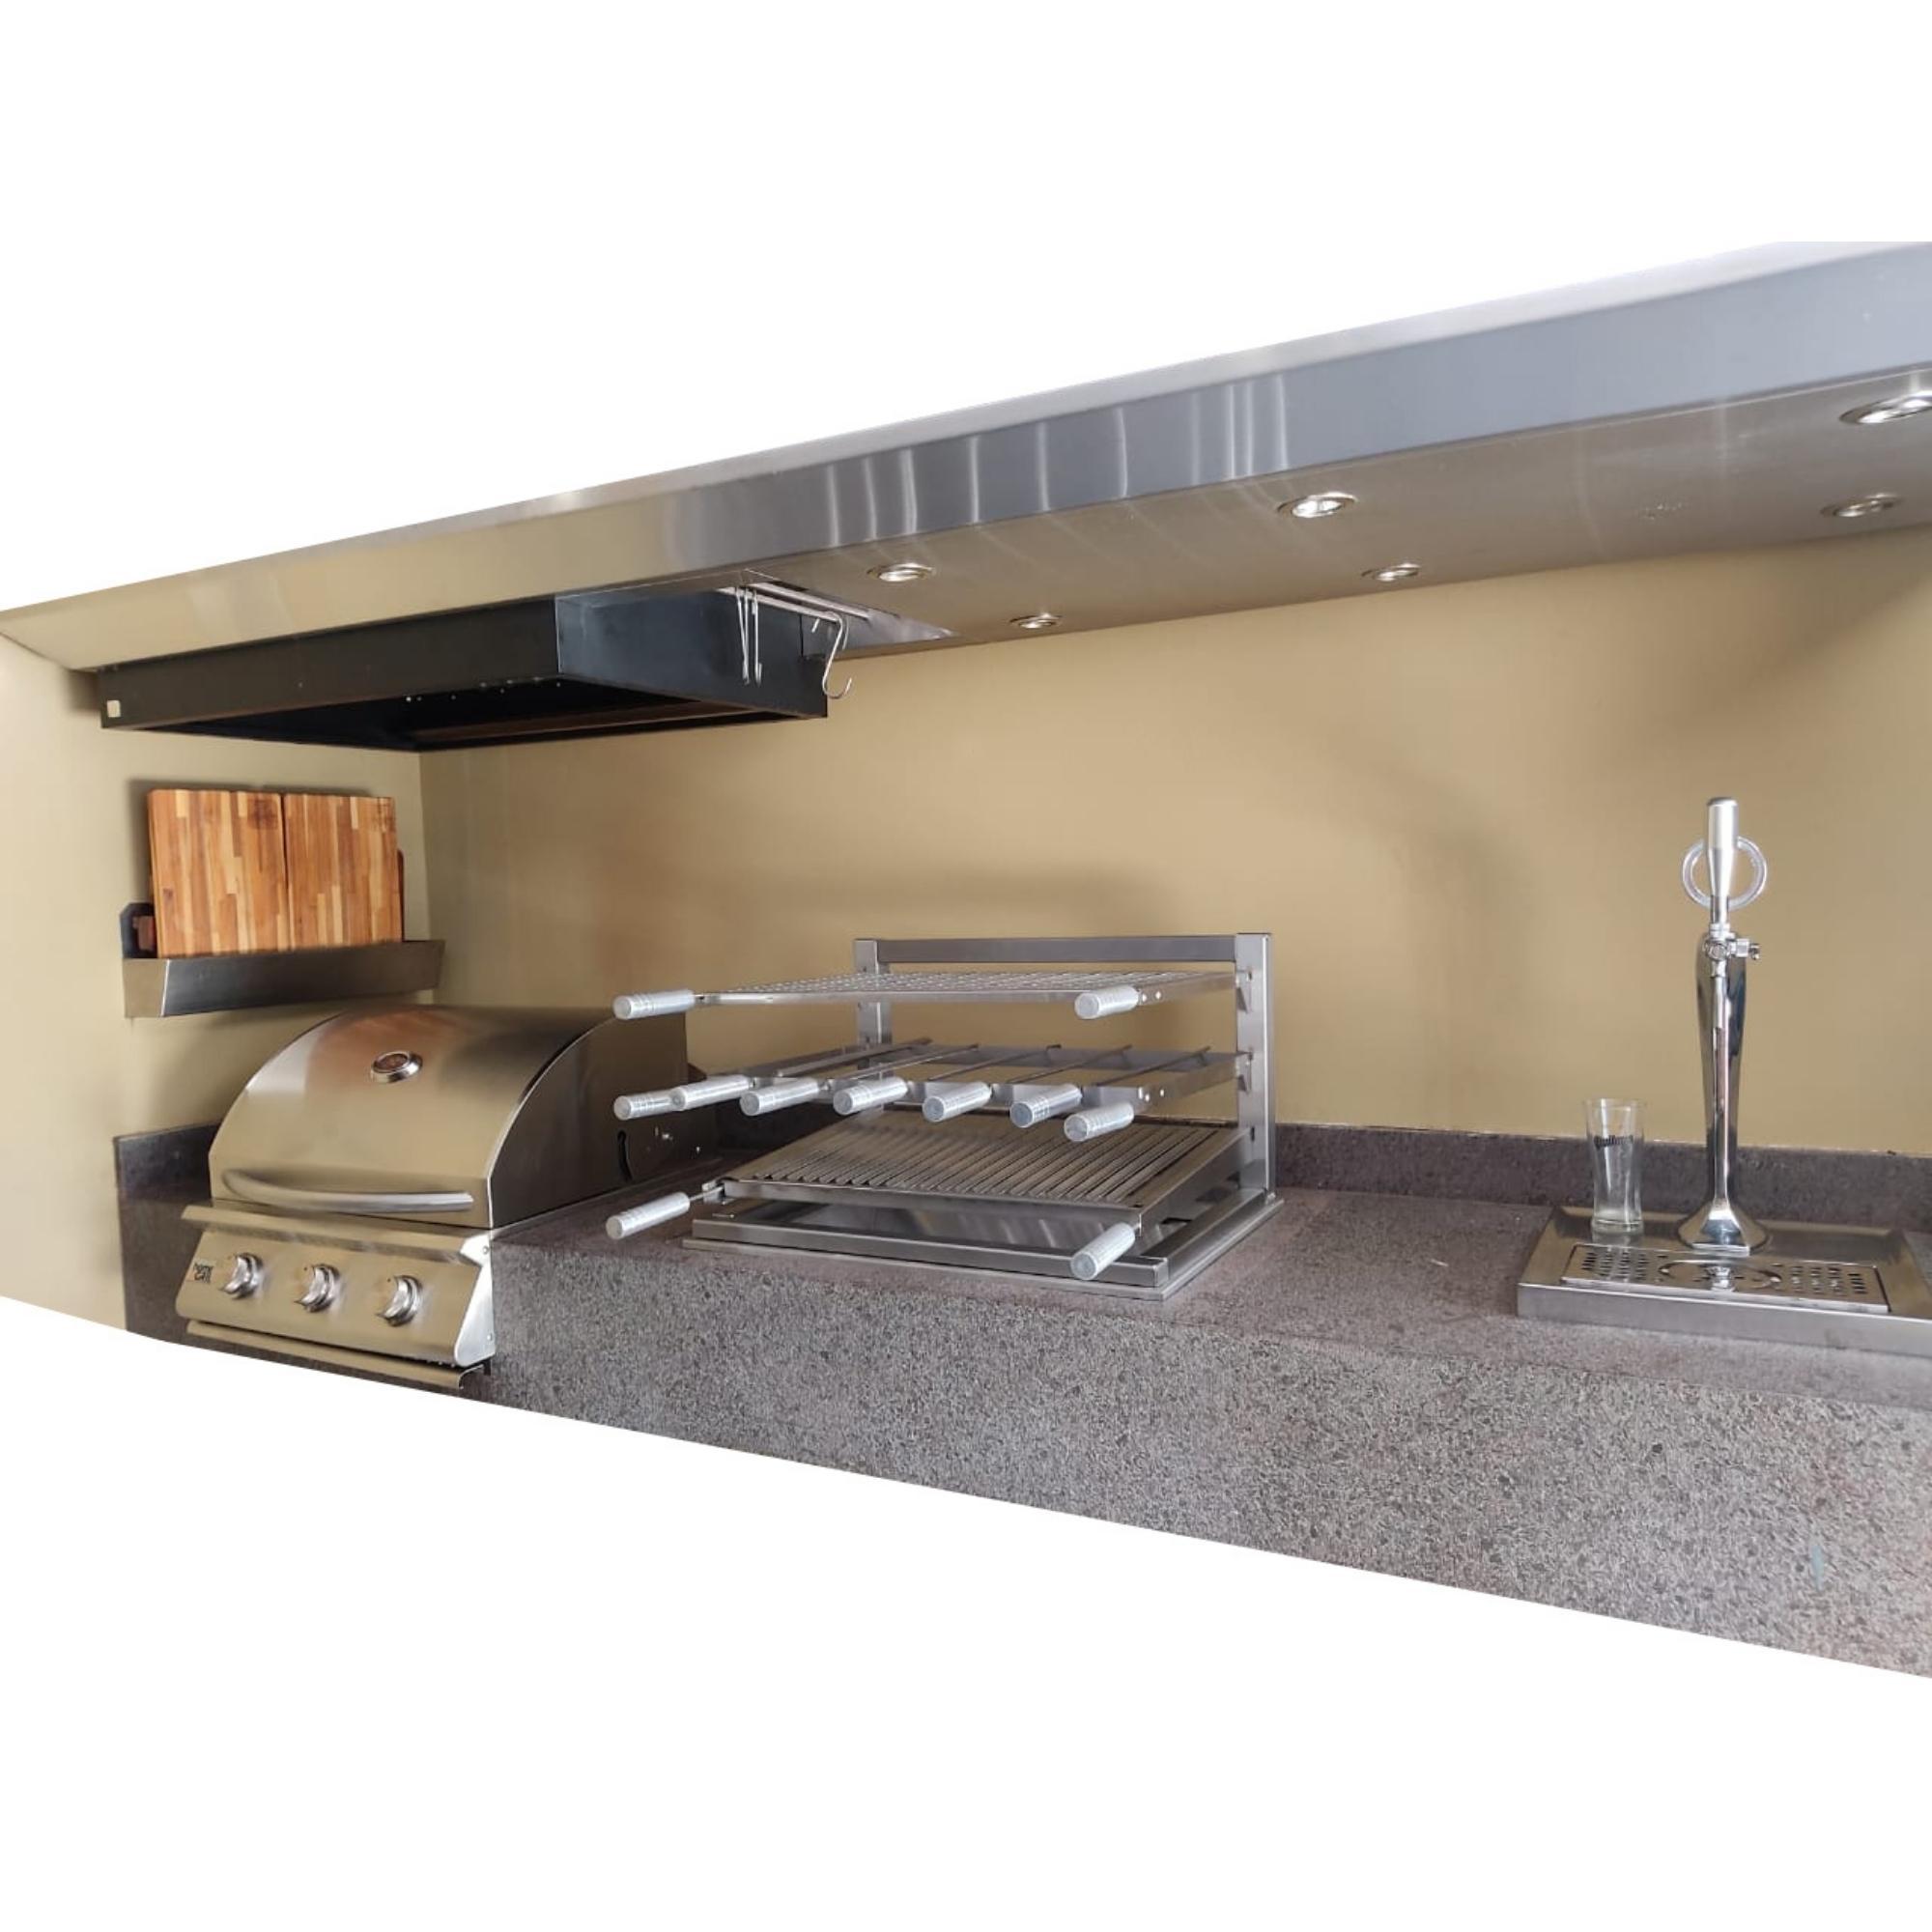 Kit Grill Master 70x50  - Sua Casa Gourmet e Cia